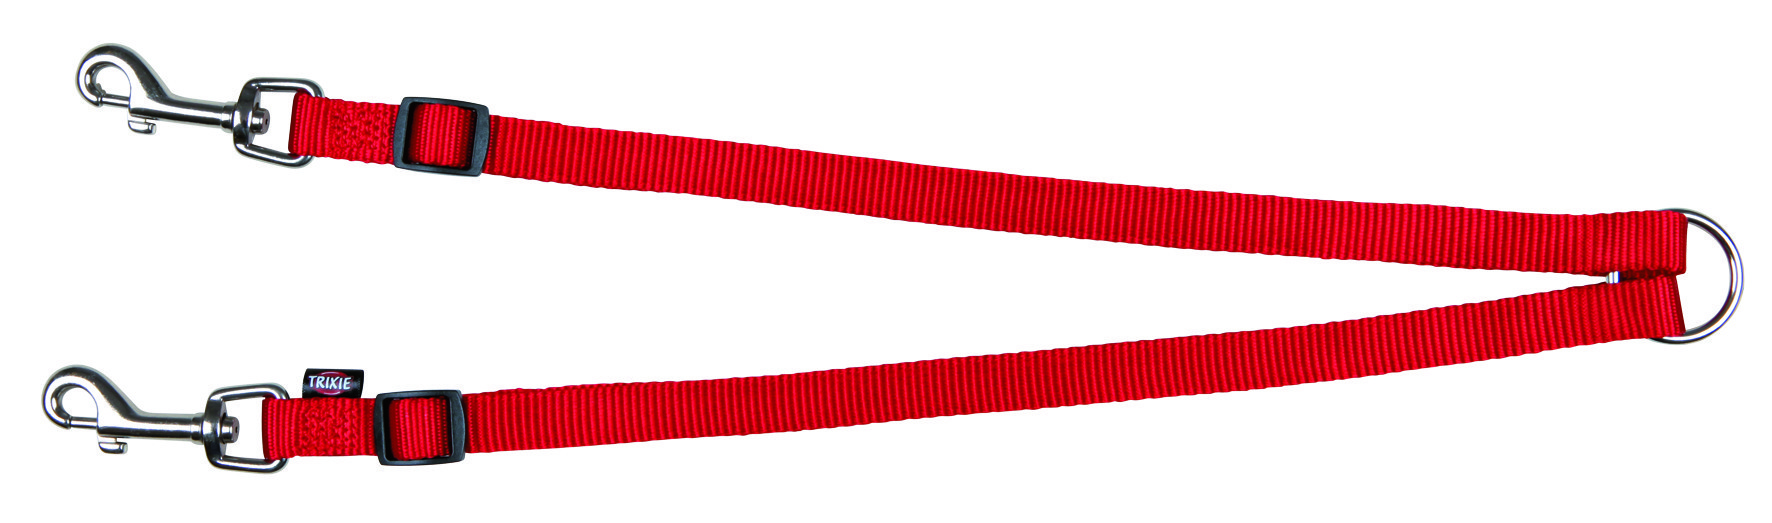 Koppel aus Nylon für 2 Hunde 40-70cm 15mm rot Bild 1